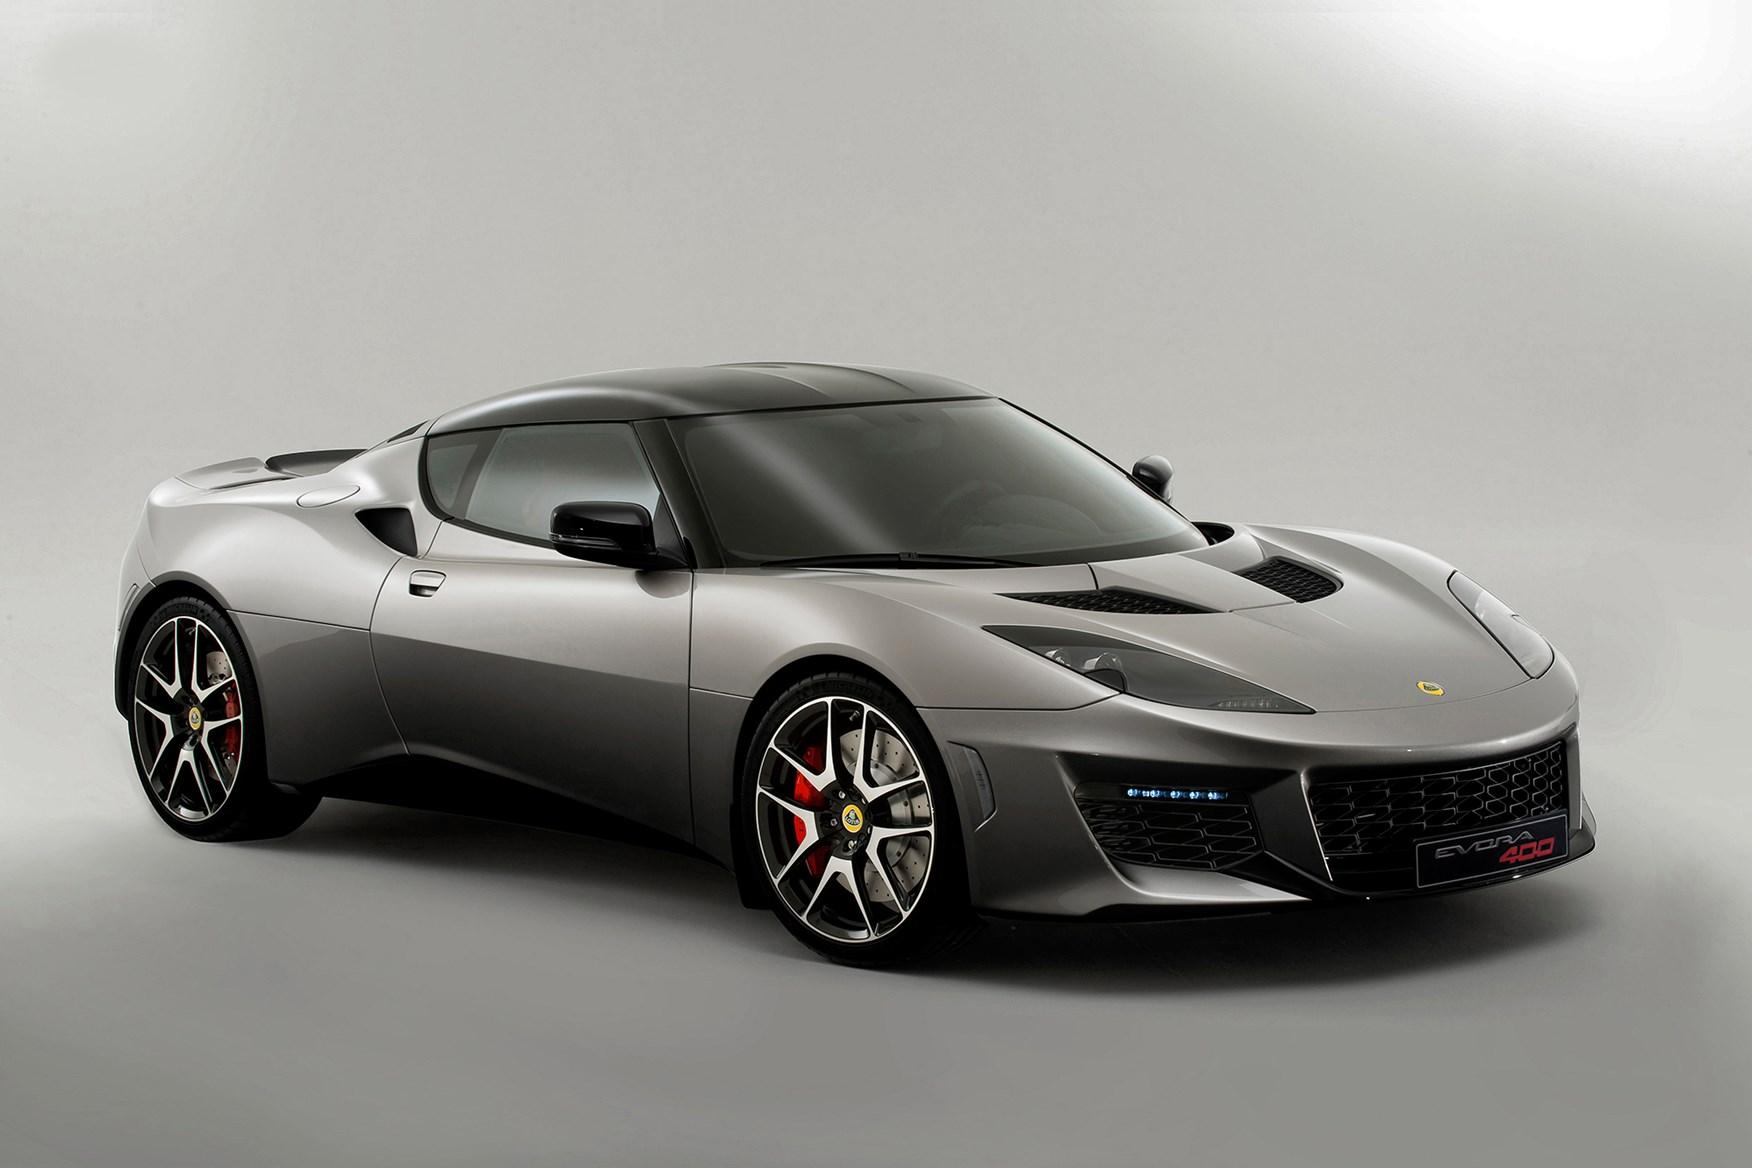 lotus evora 400 first pictures 2015 norfolk s fastest supercar rh carmagazine co uk